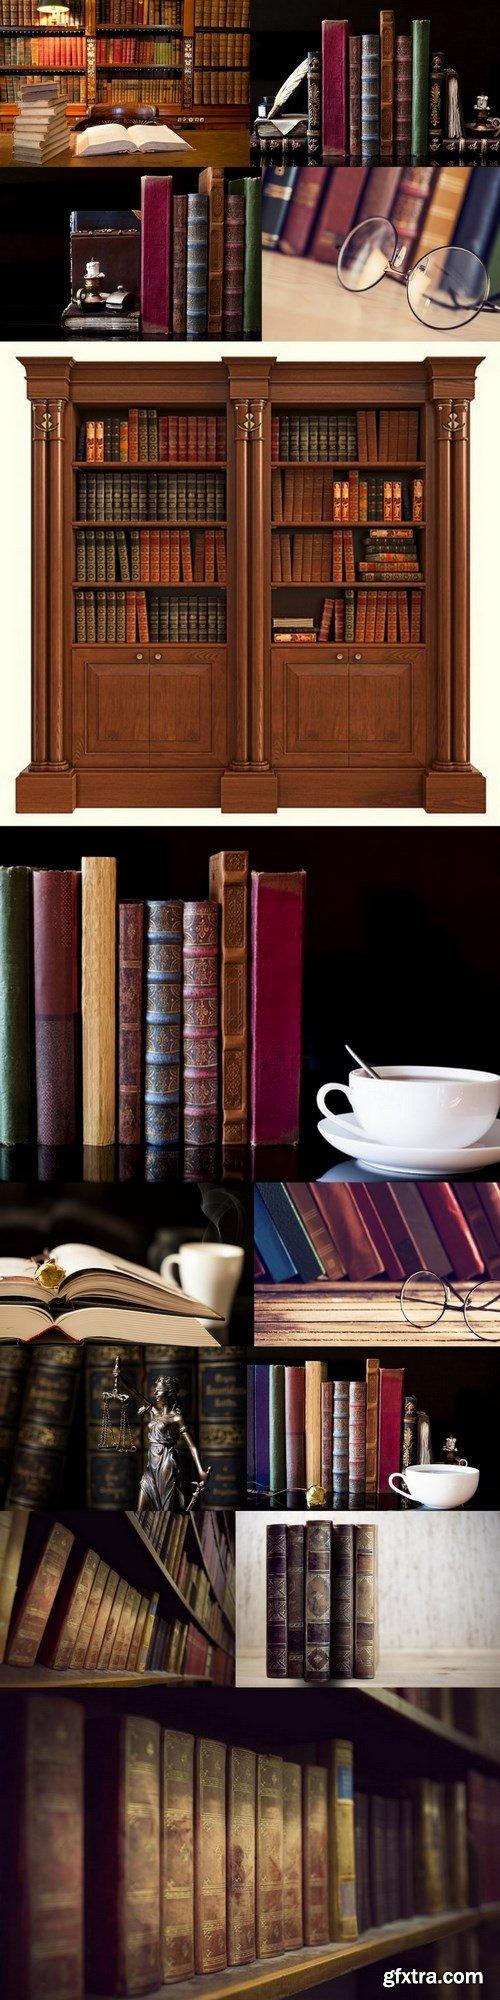 Library -13 UHQ JPEG